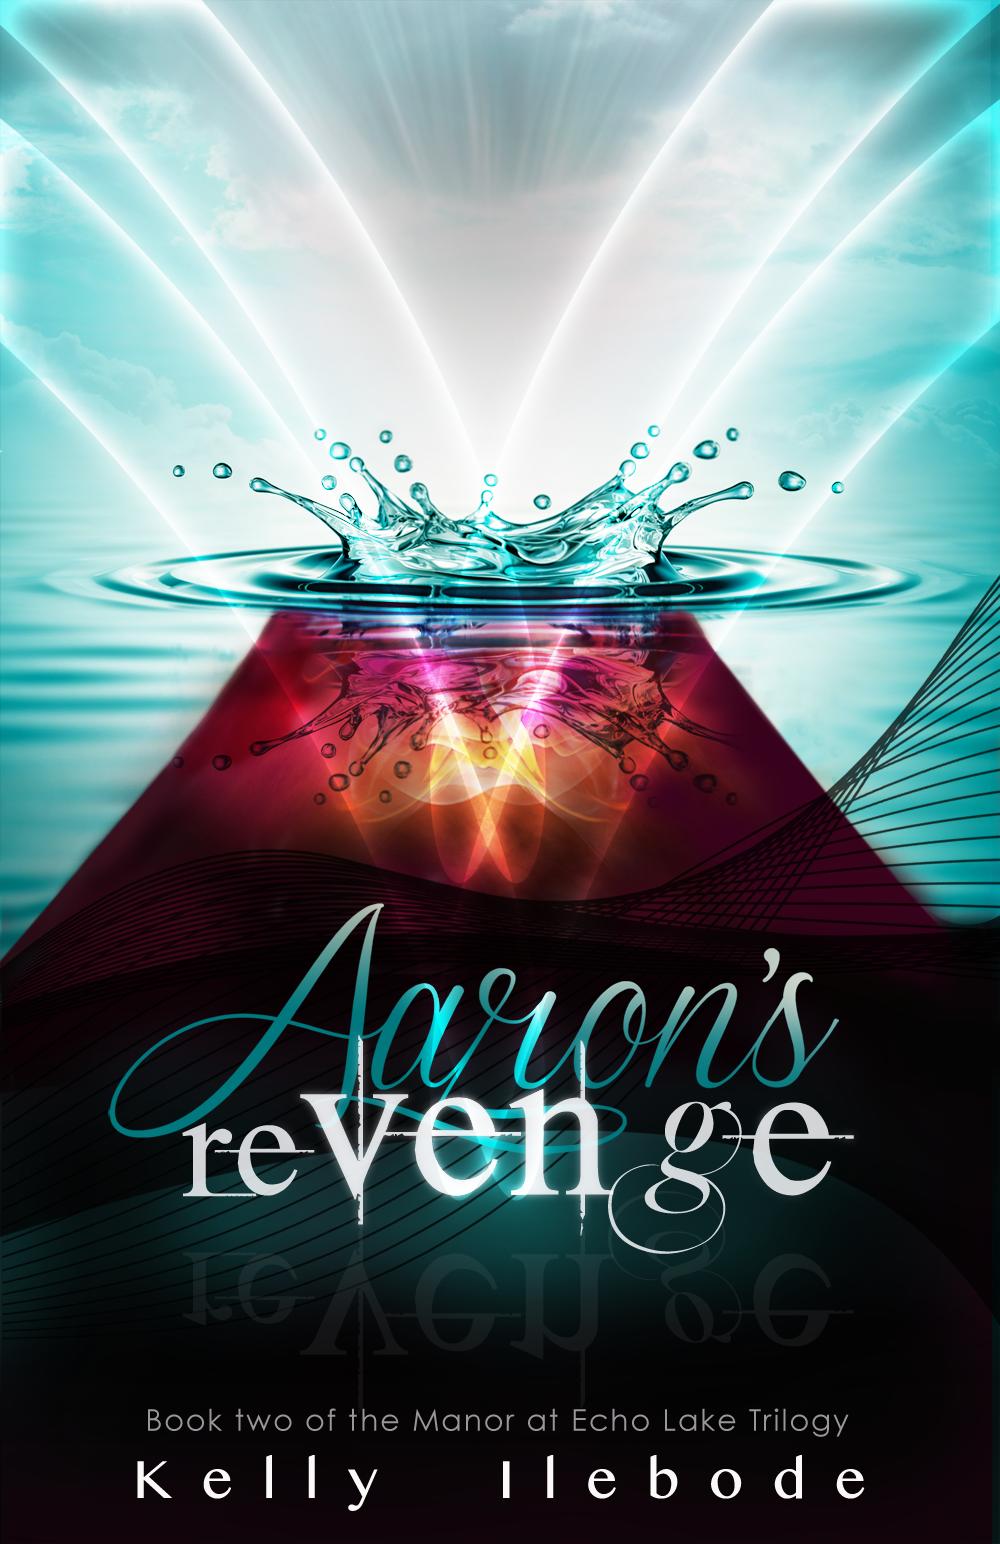 Aaron's Revenge Volume 2